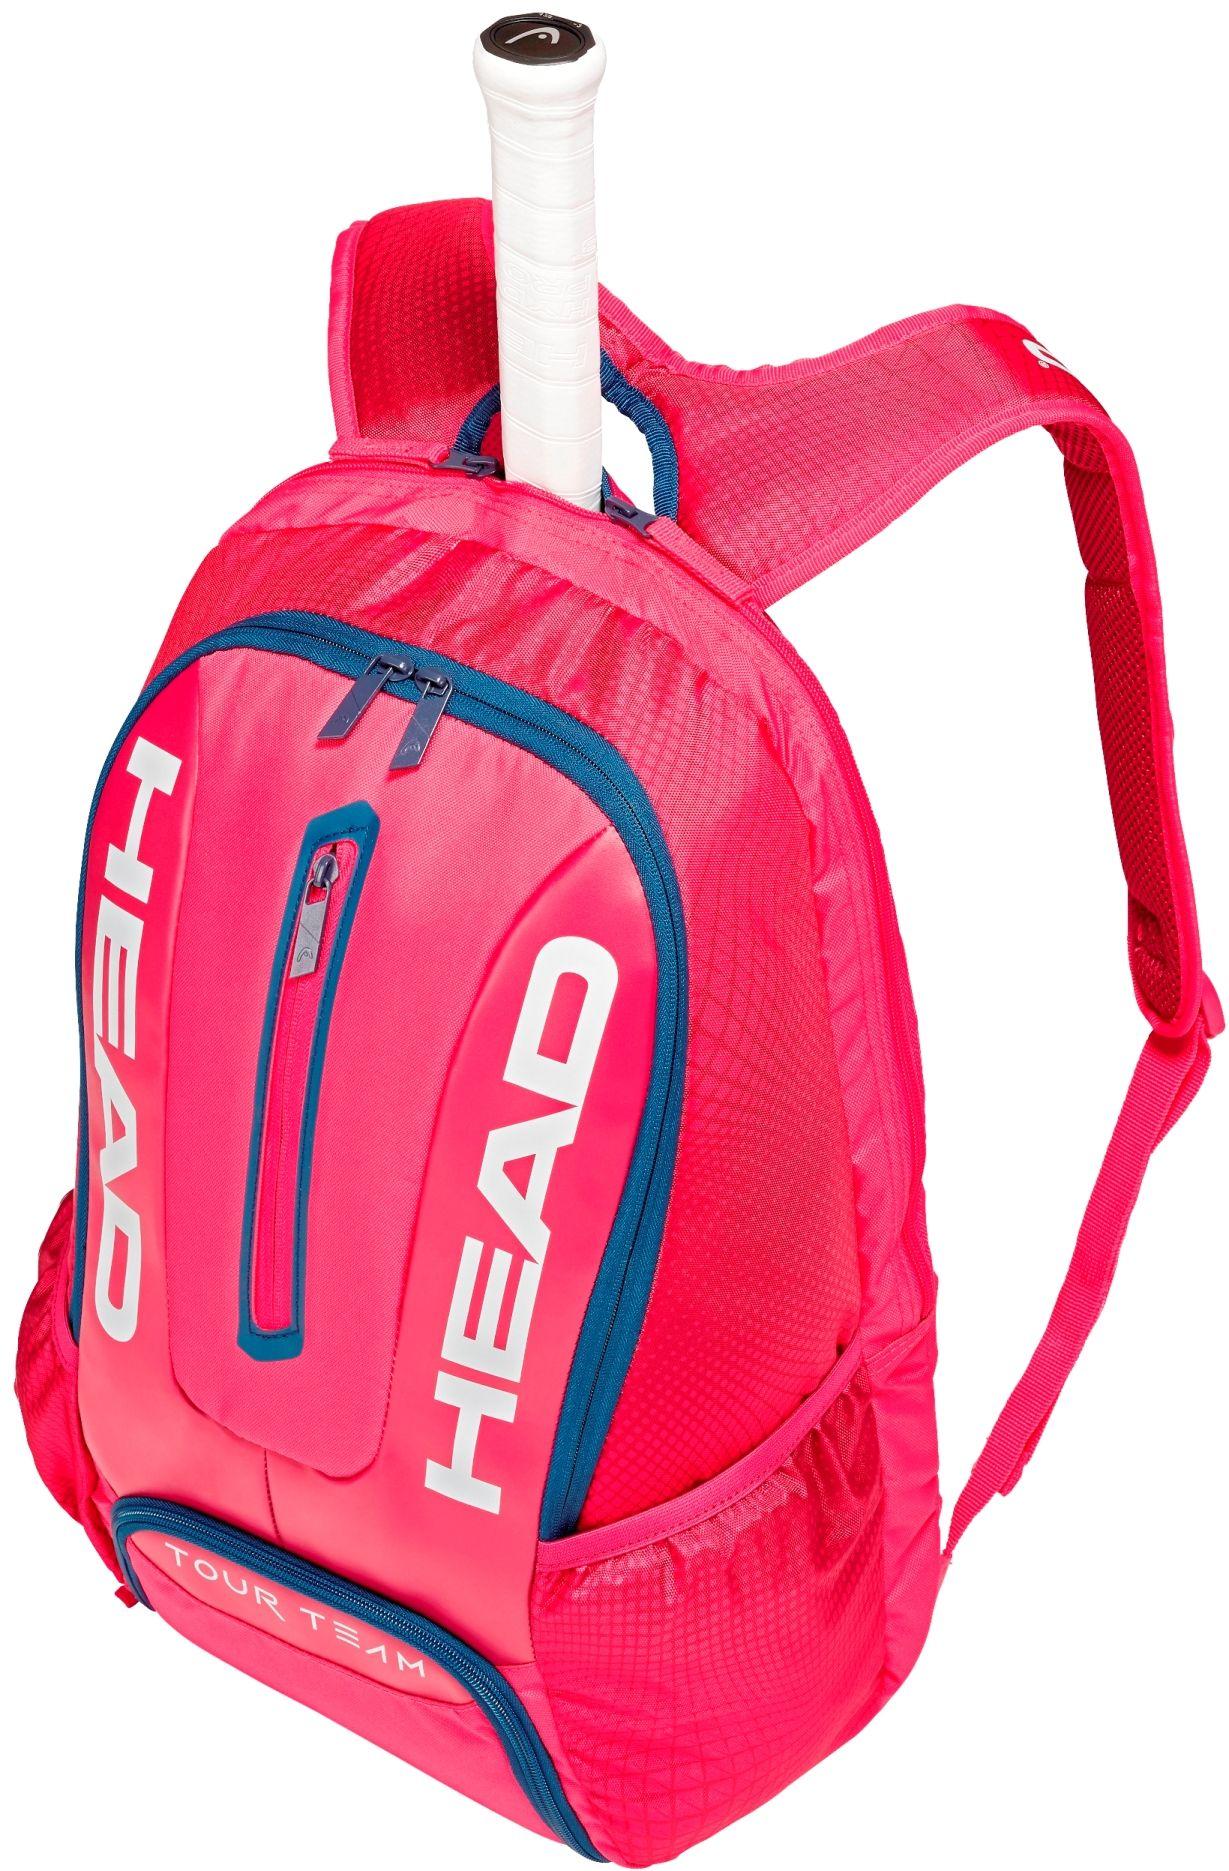 Head Tour Team Tennis Backpack Raspberry Navy 39 95 Tennis Backpack Tennis Bags Tennis Bags Backpacks